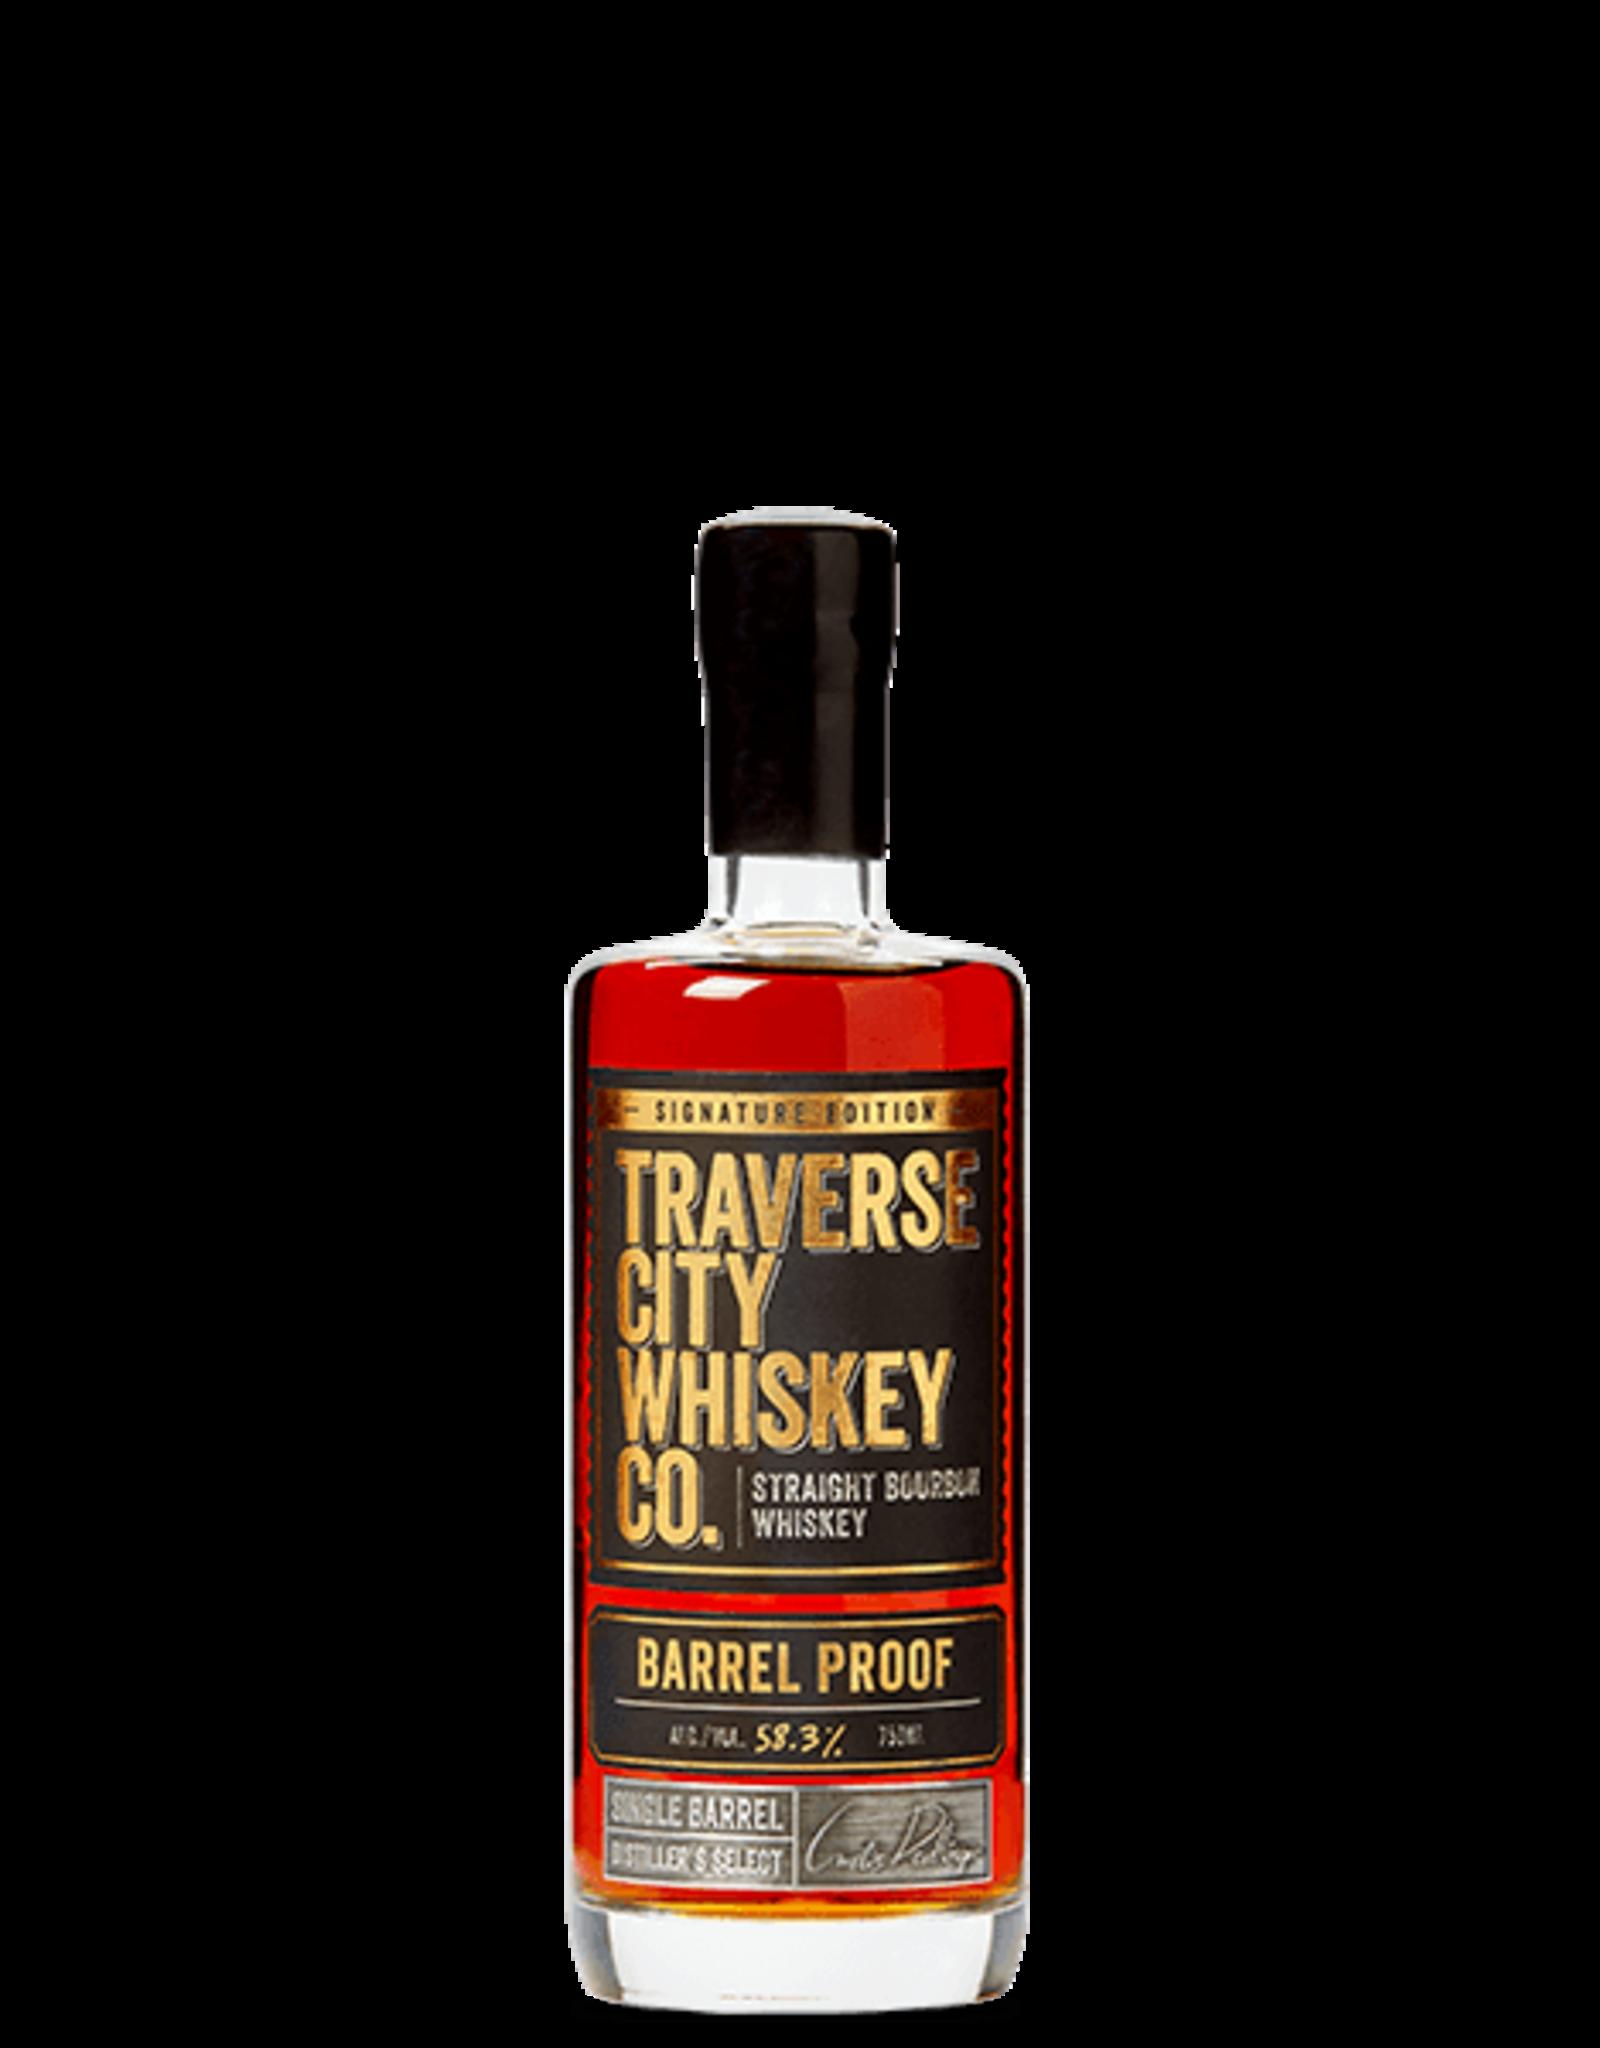 Traverse City Whiskey Co. Barrel Proof Straight Bourbon